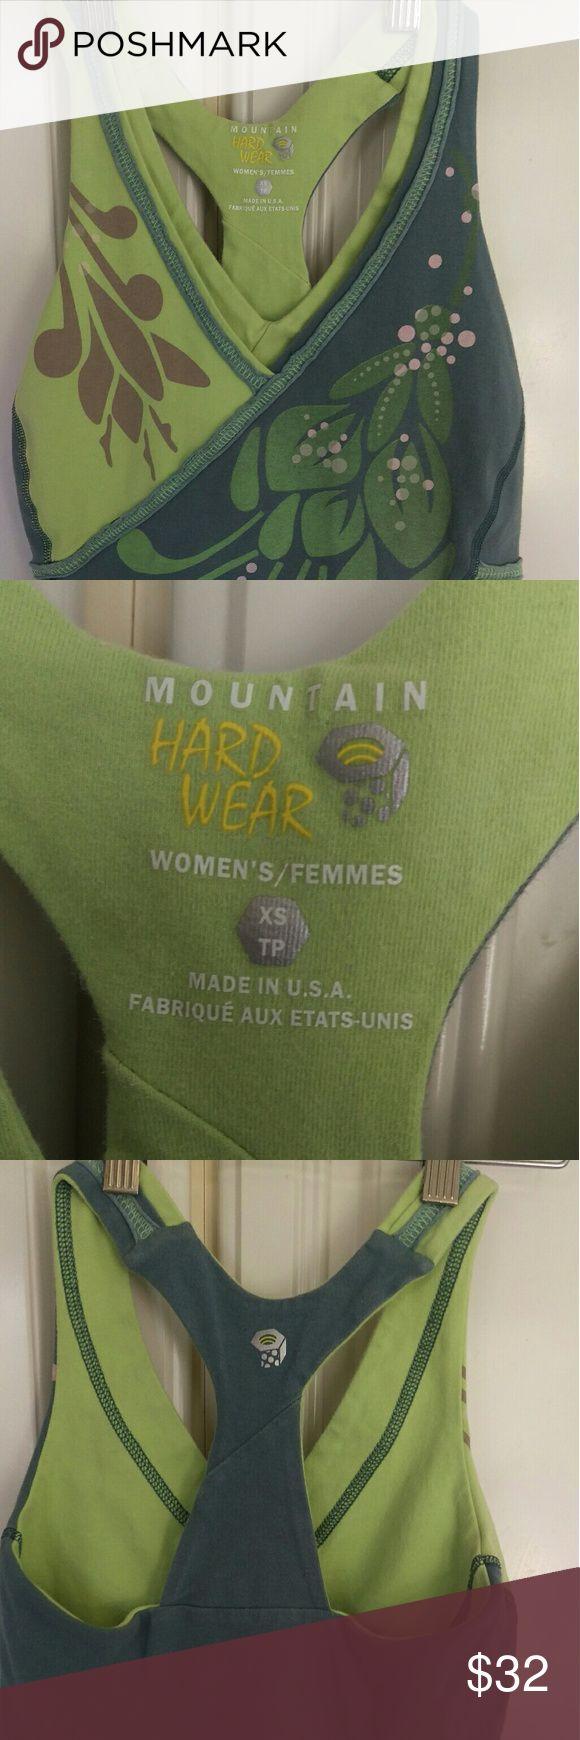 Mountain Hard Ware NWOT XS razorback yoga shirt XS workout shirt razor back cotton and spandex Mountain Hard Wear Tops Tank Tops